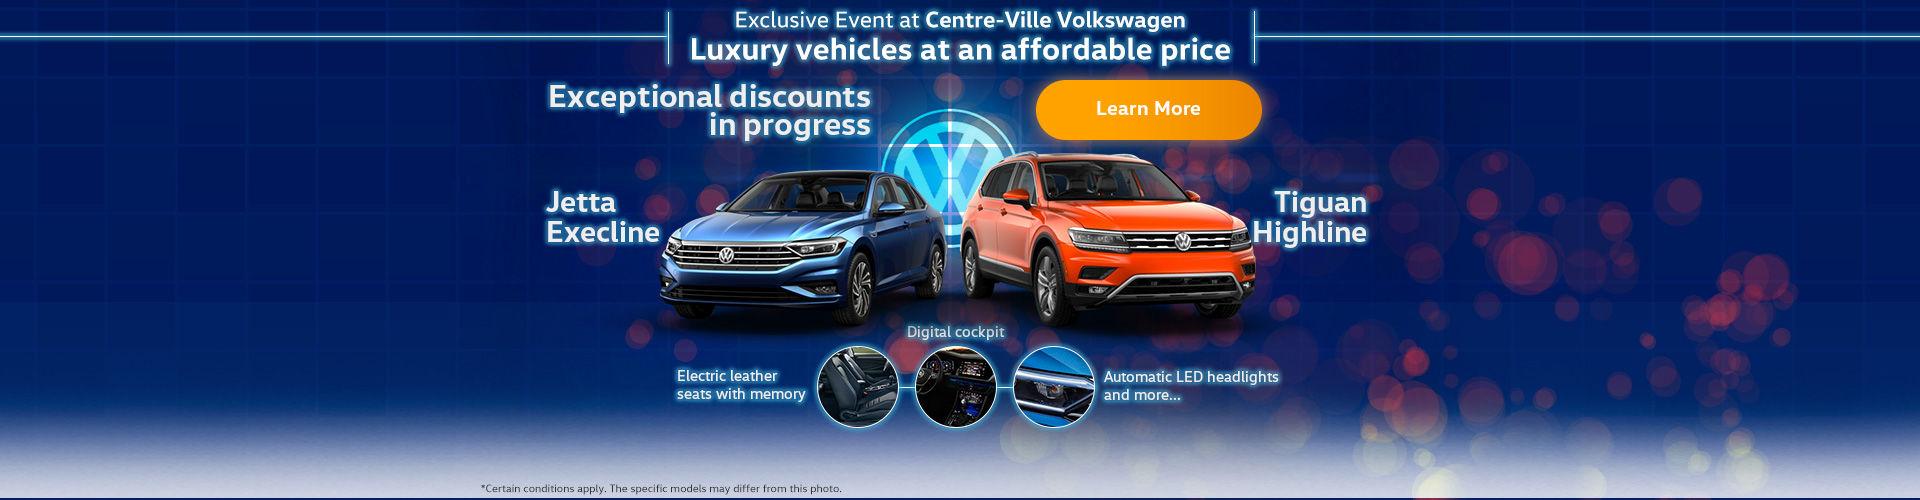 Exclusive Event at Centre-Ville Volkswagen